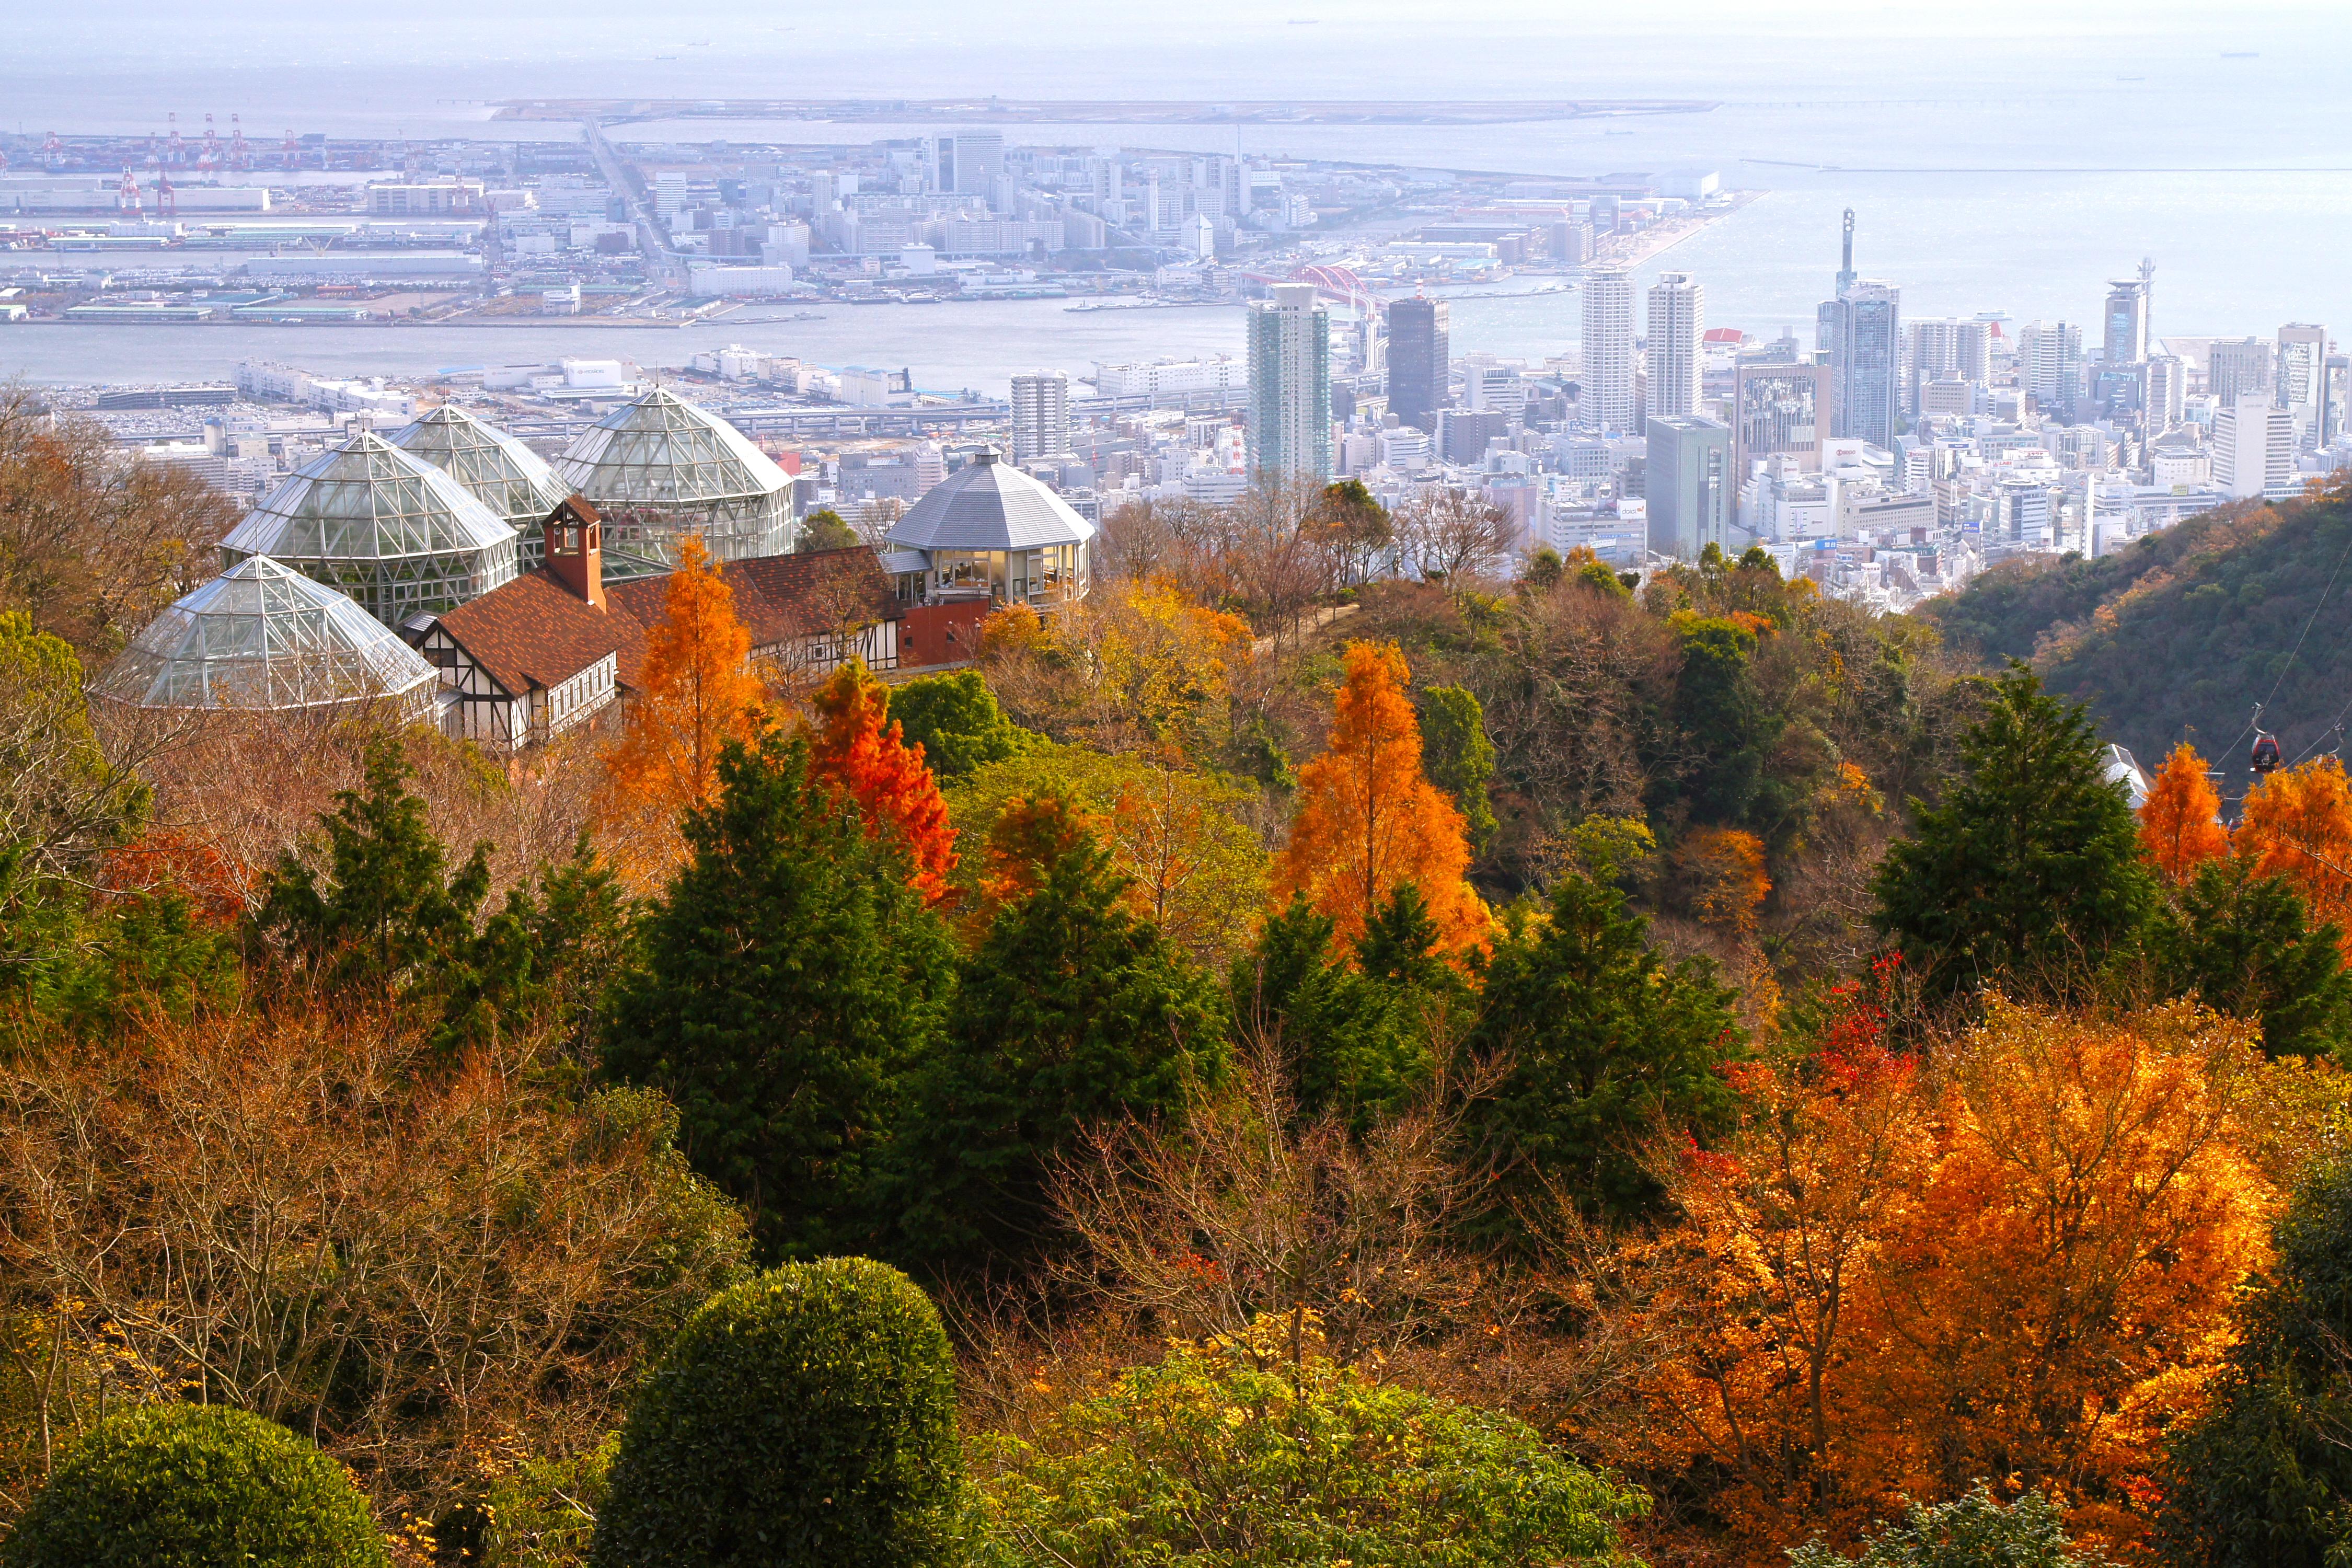 http://upload.wikimedia.org/wikipedia/commons/d/dd/121208_Nunobiki_Herb_Garden_Kobe_Hyogo_pref_Japan01s3.jpg